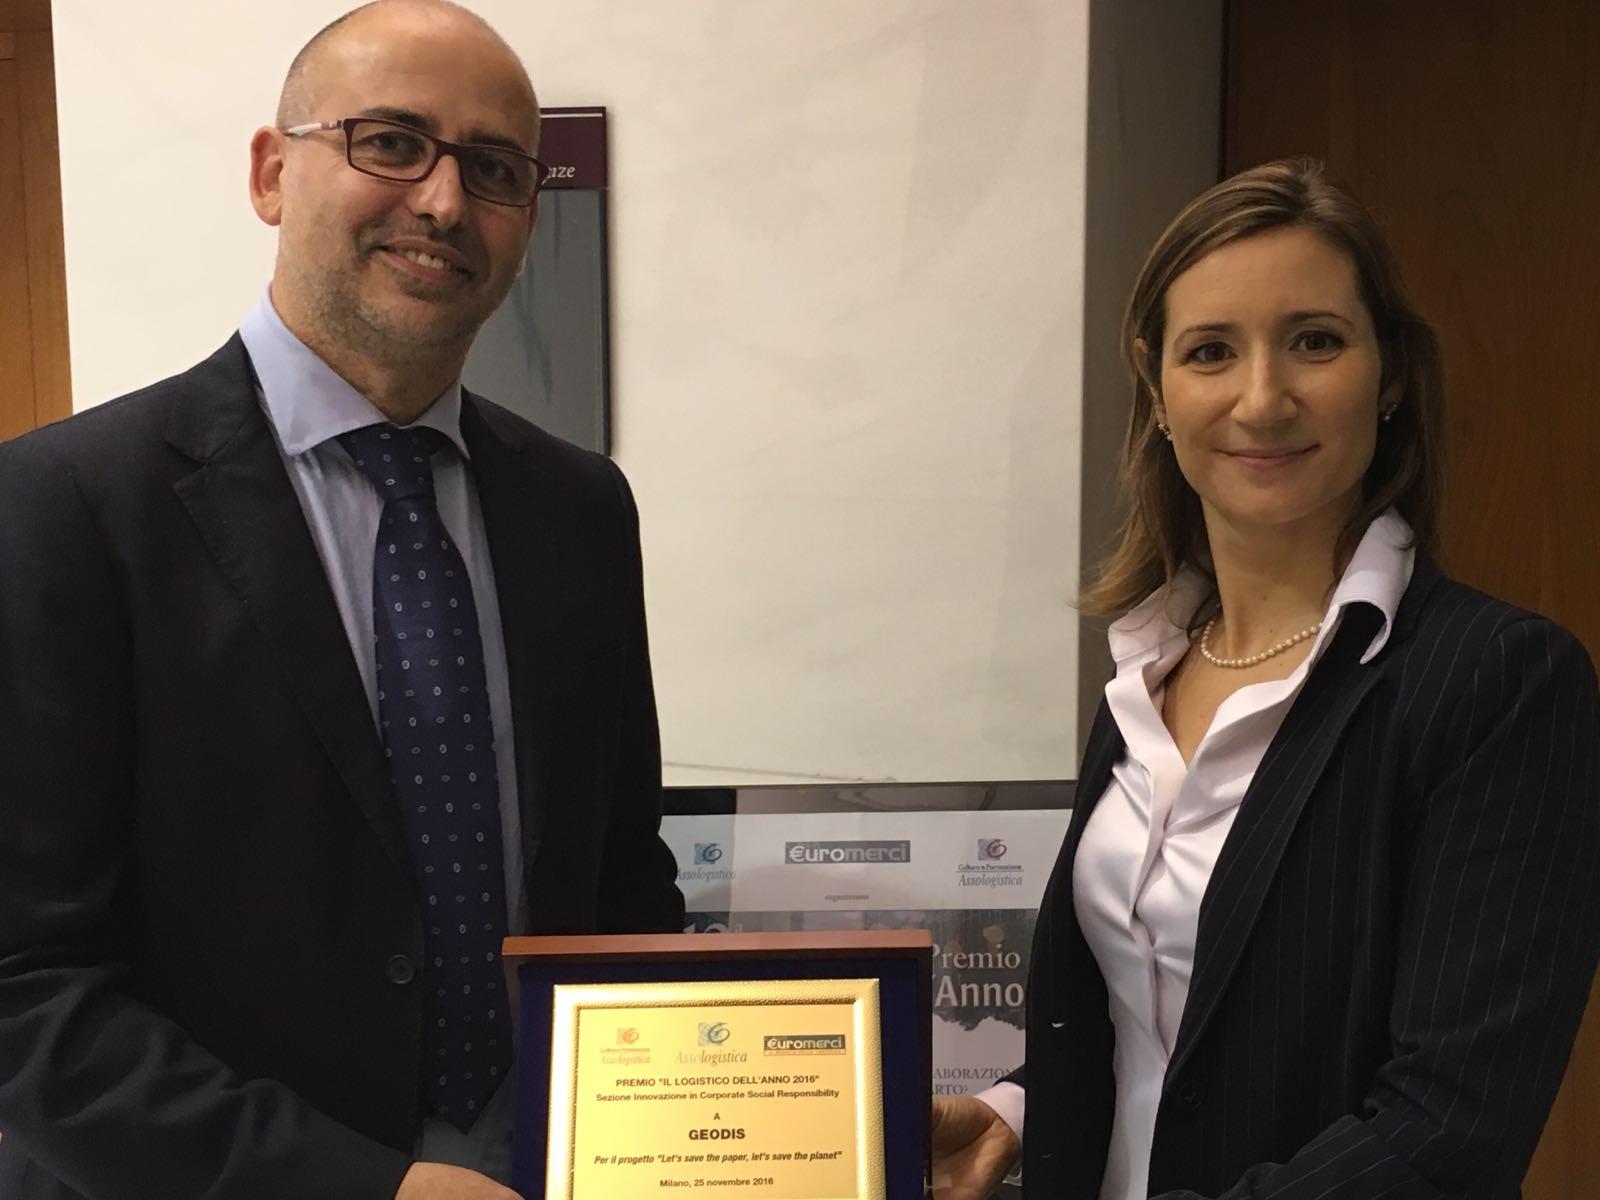 Pamela Calderoli receiving the award